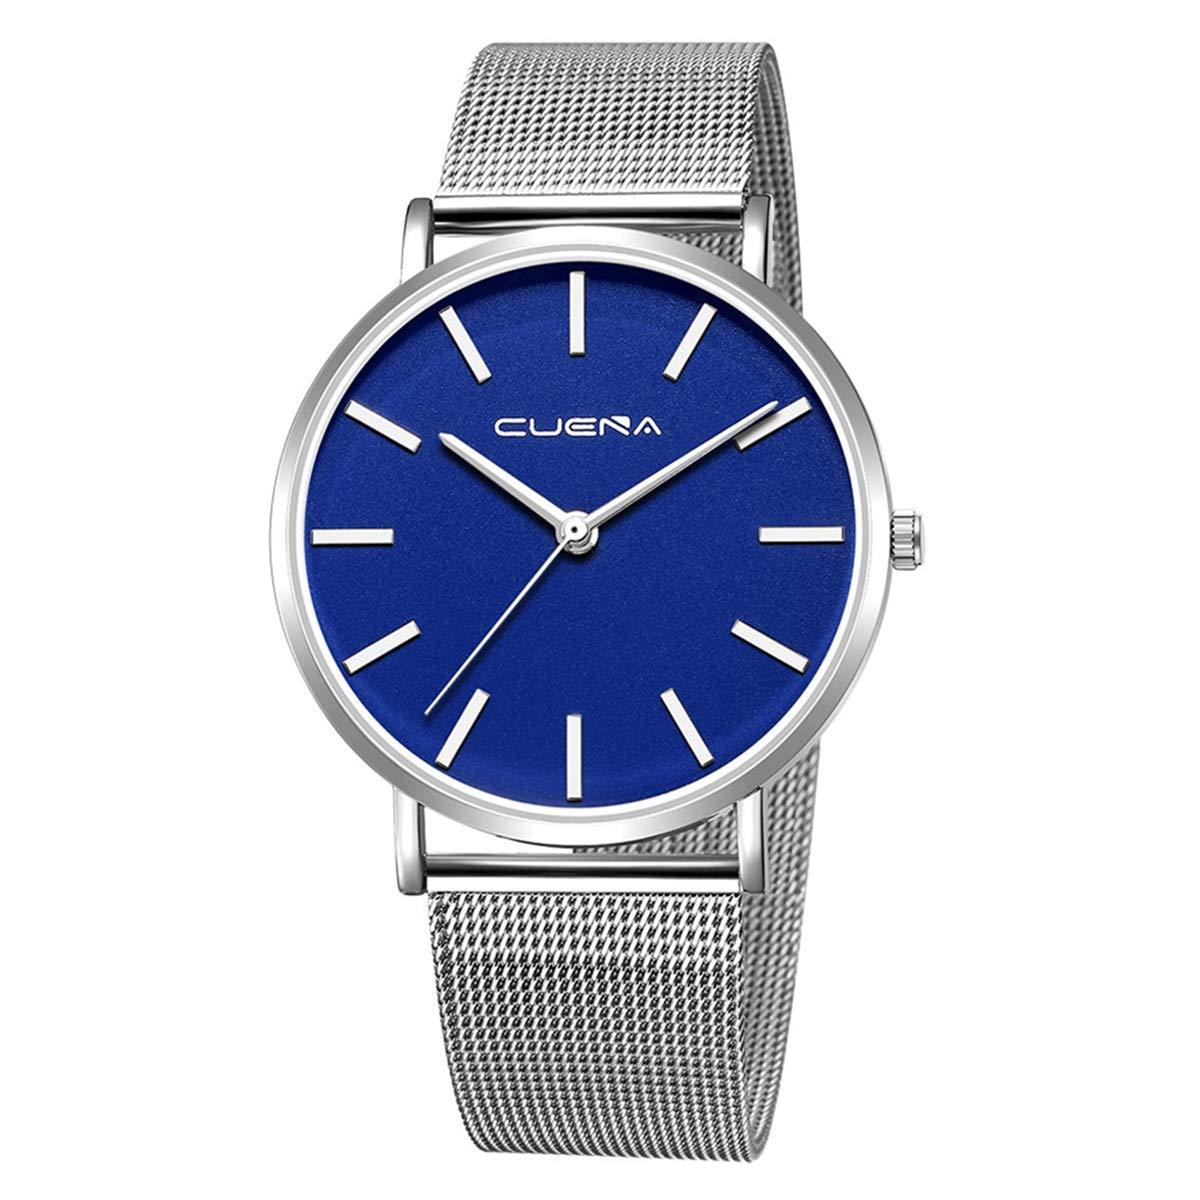 ZODRQ Men's Watch,Fashion Watches Stainless Steel Mesh Wrist Watch Casual Wristwatch Quartz Watch for Men Gift (J) by ZODRQ